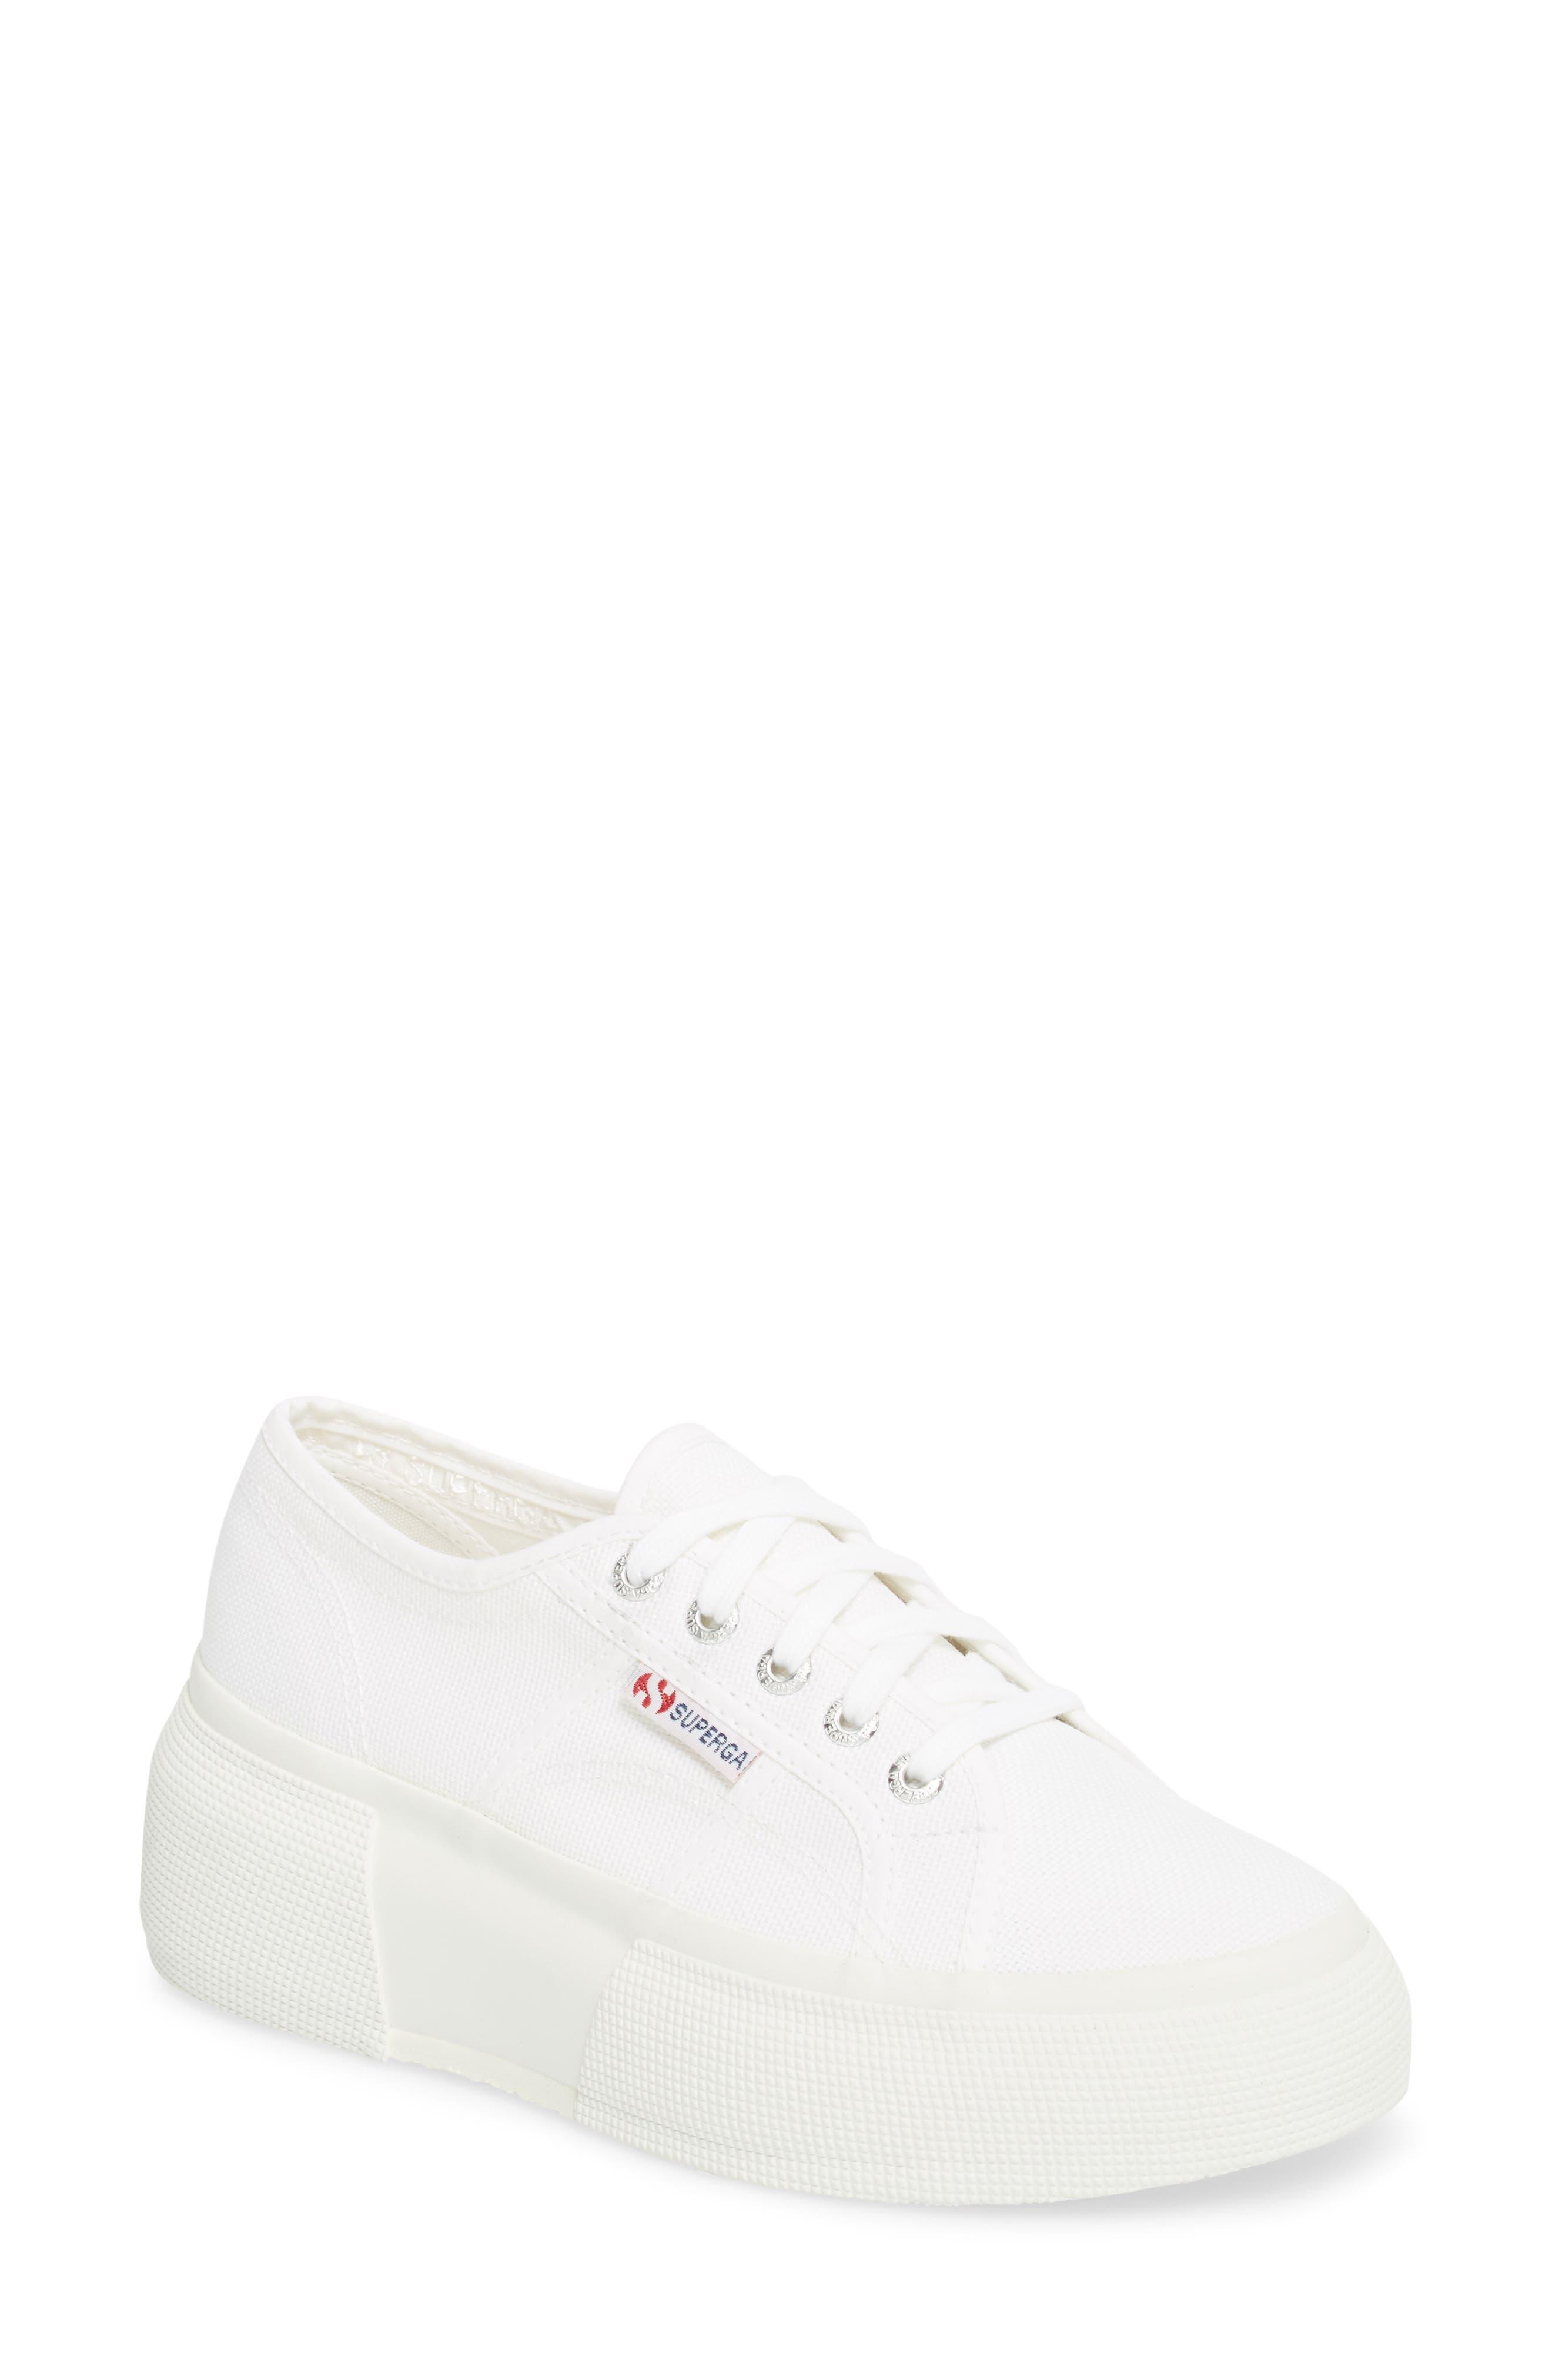 2287 Cotu Platform Sneaker,                         Main,                         color, White